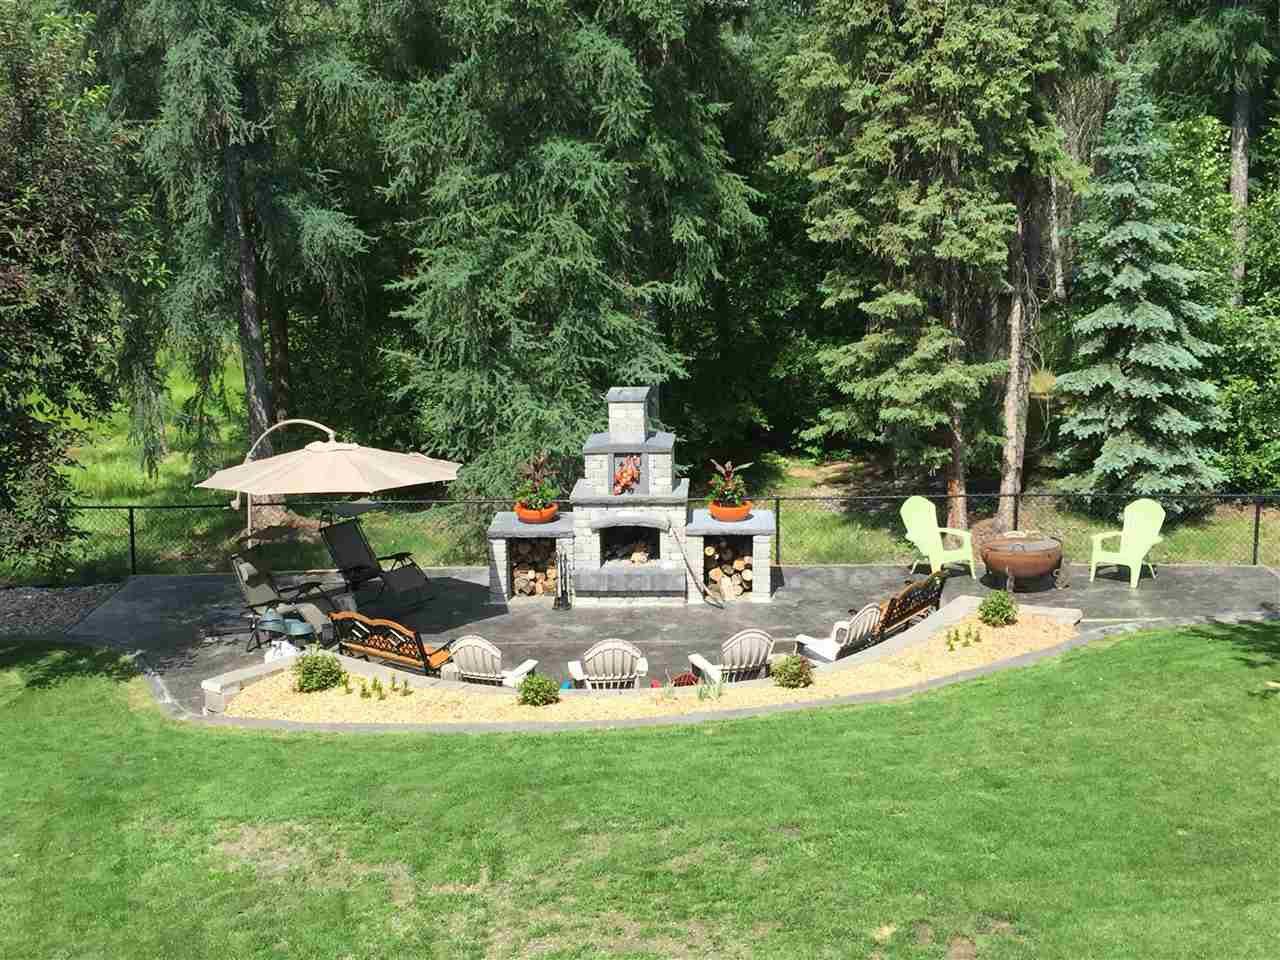 Photo 41: Photos: 370 50417 Rge Rd 232: Rural Leduc County House for sale : MLS®# E4188169